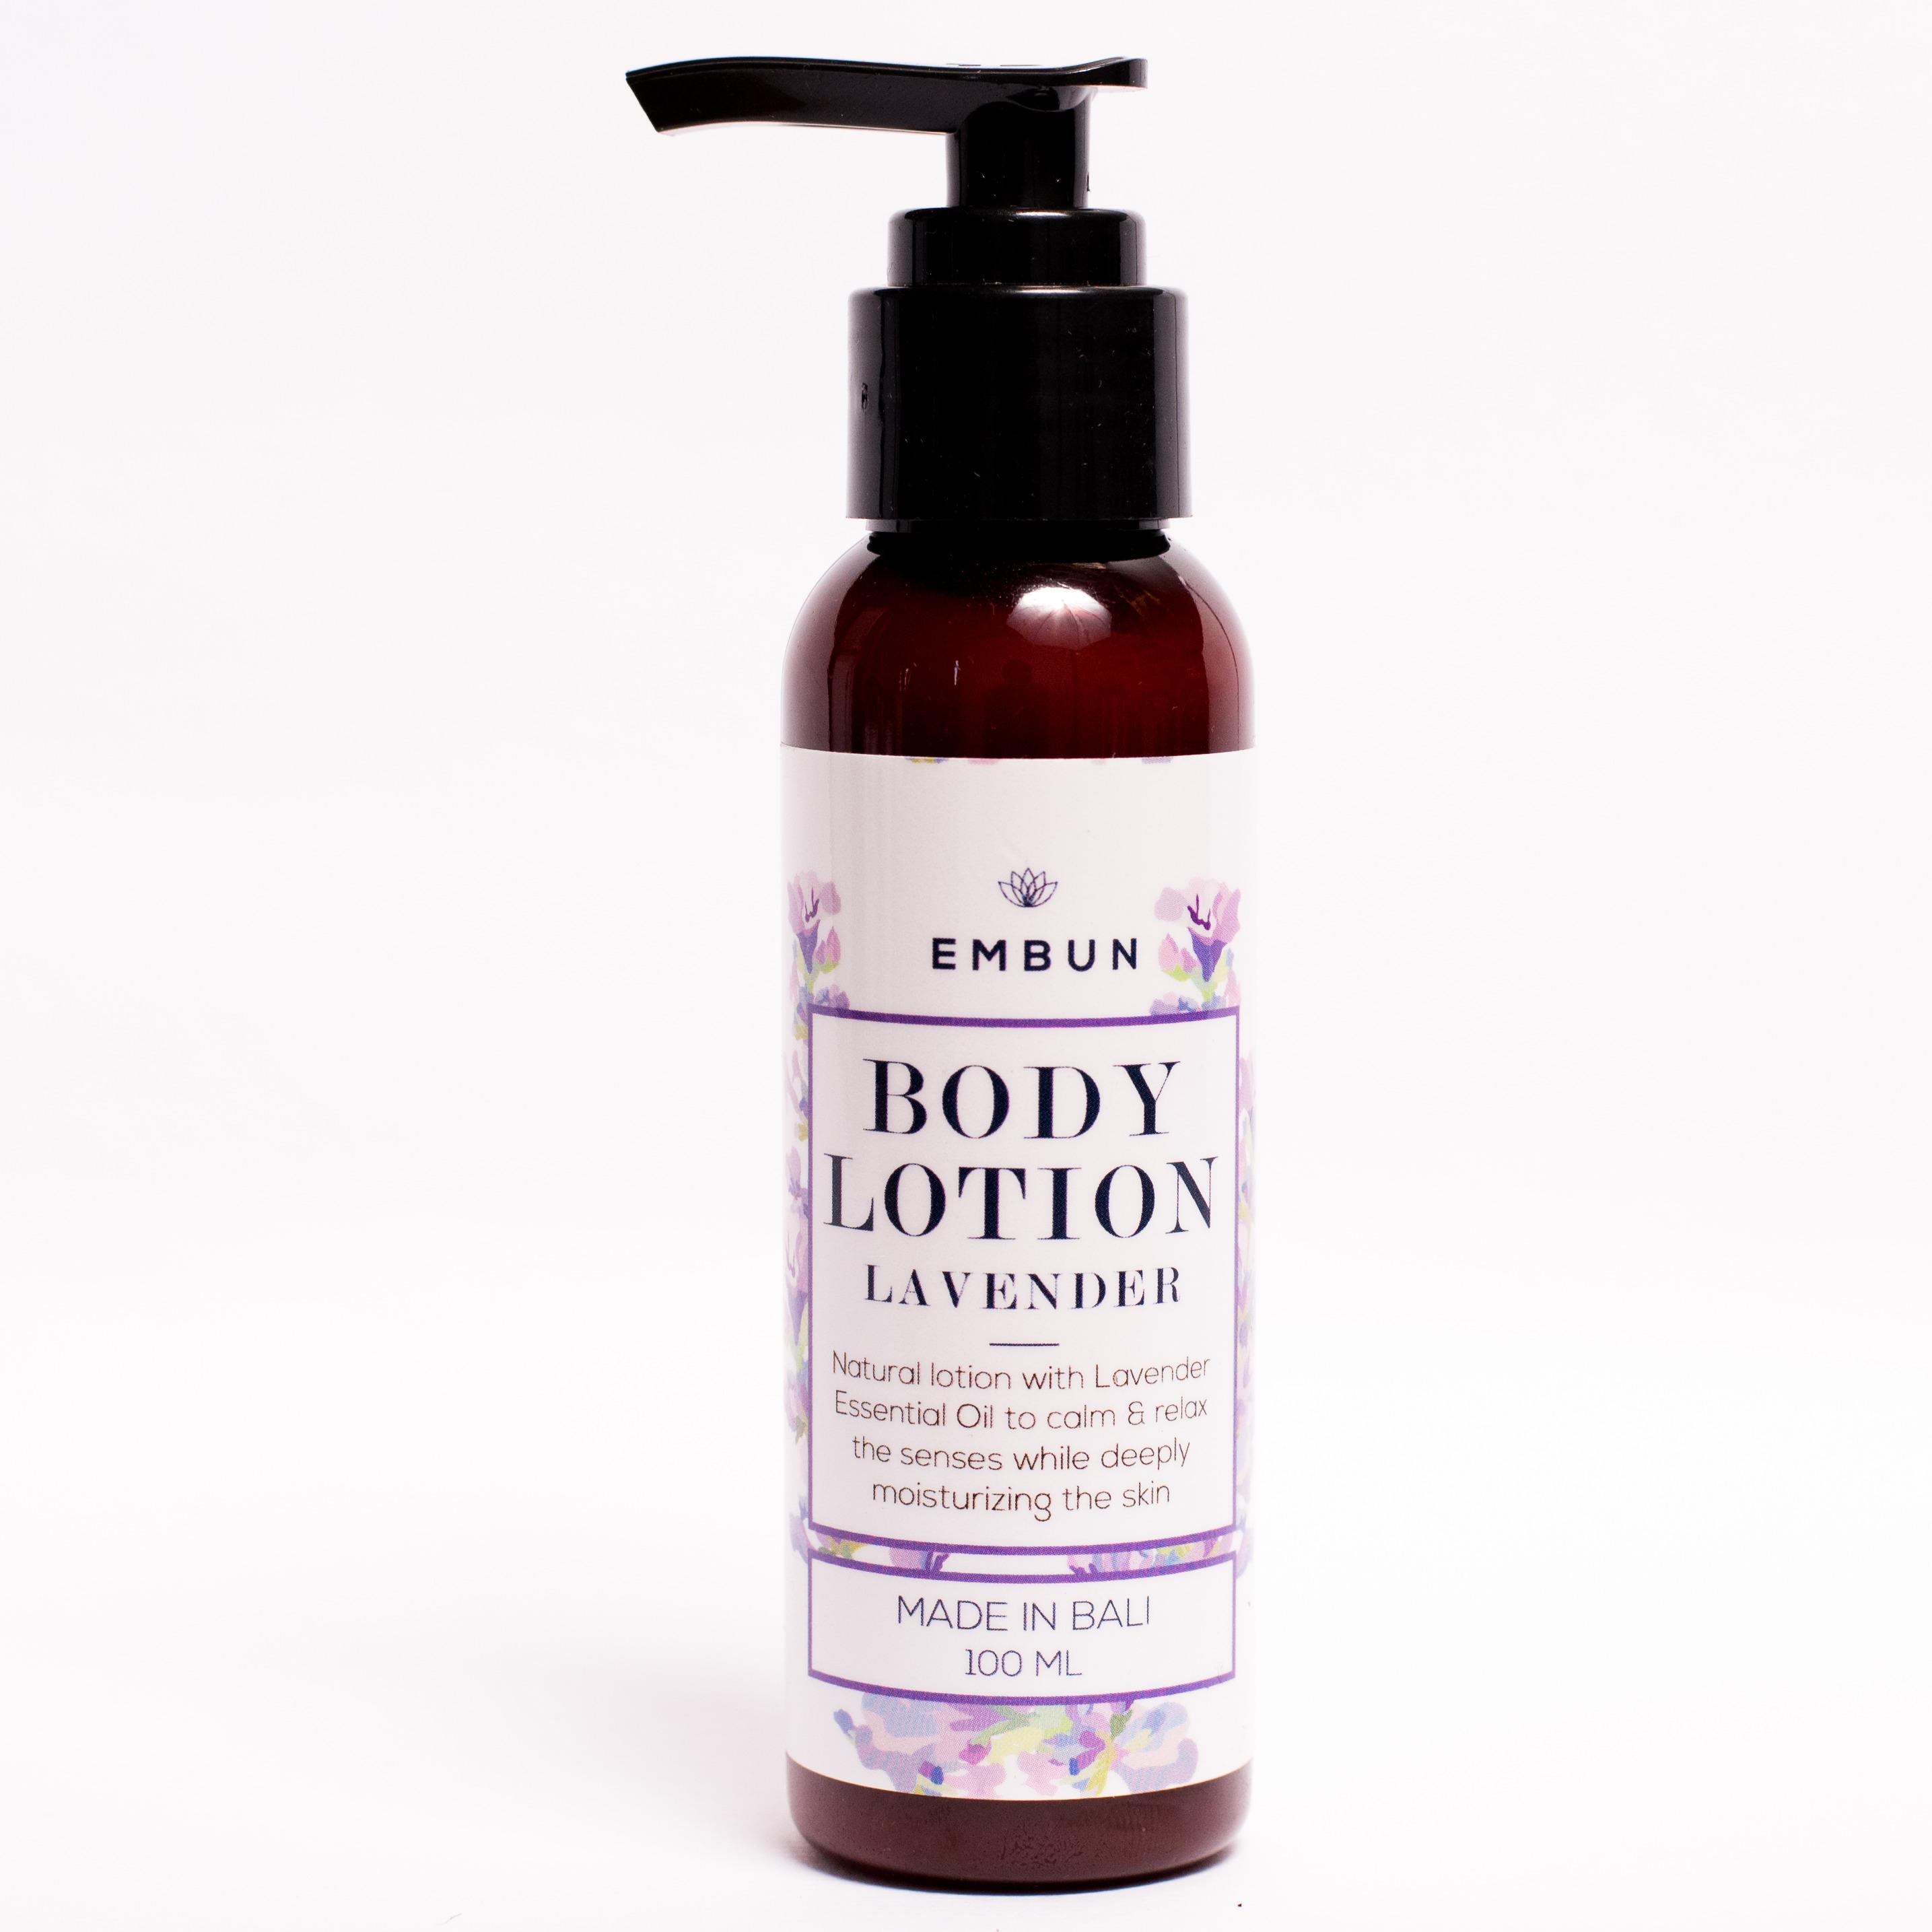 Embun Body Lotion Calming Lavender